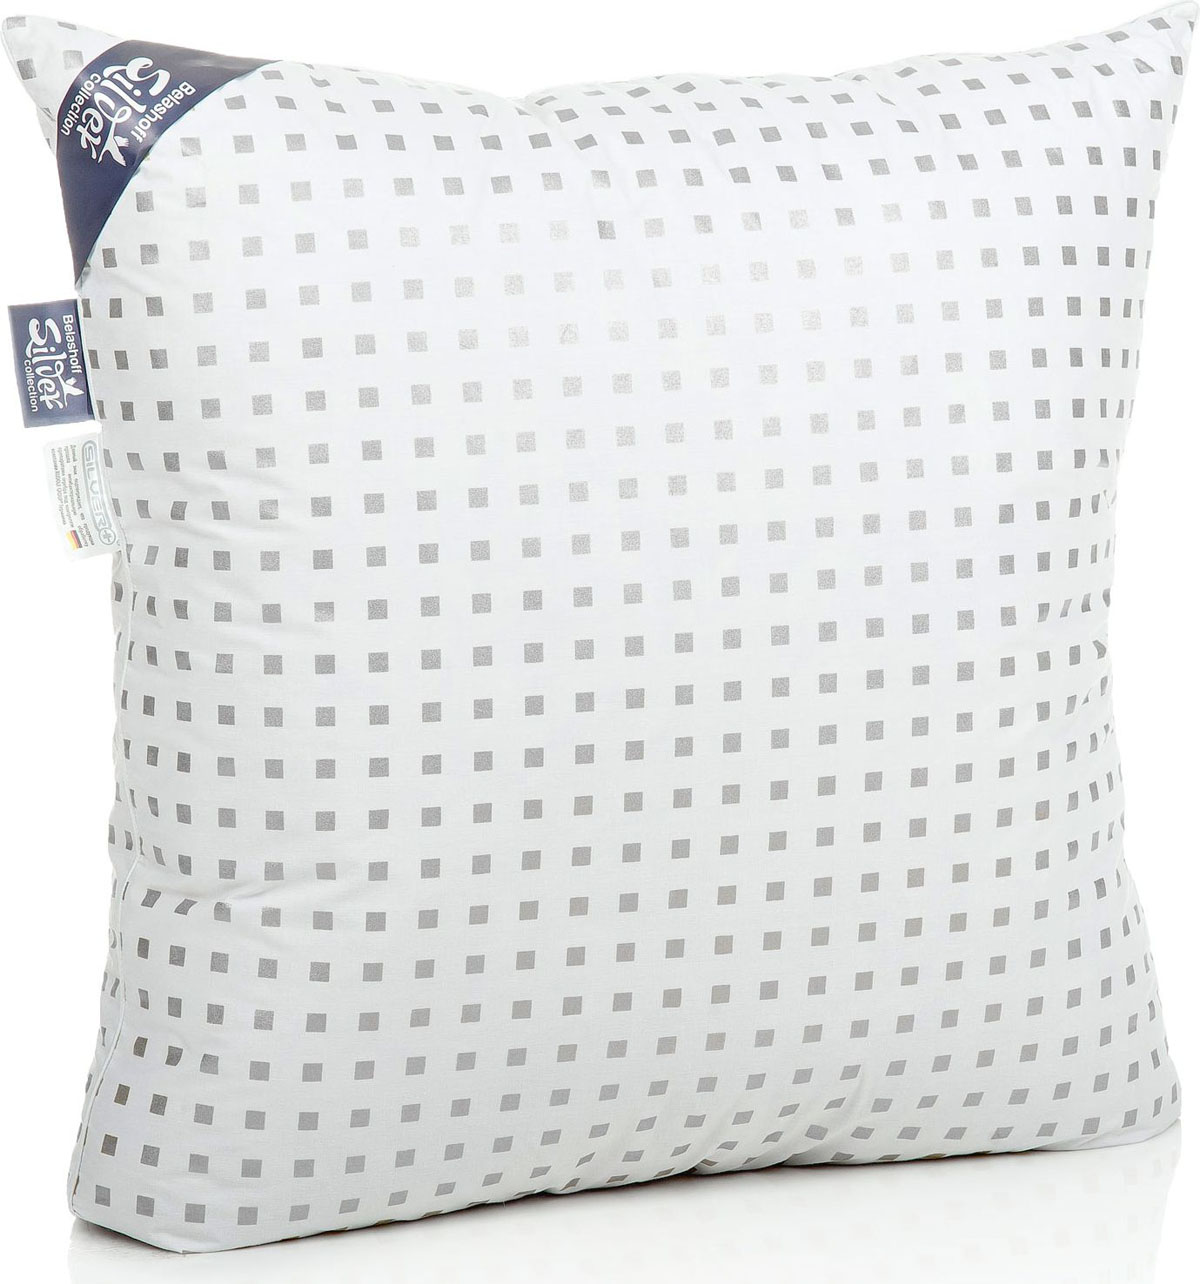 Belashoff Silver Подушка 750 цвет белый 68 x 68 см матрасы подушки и одеяла